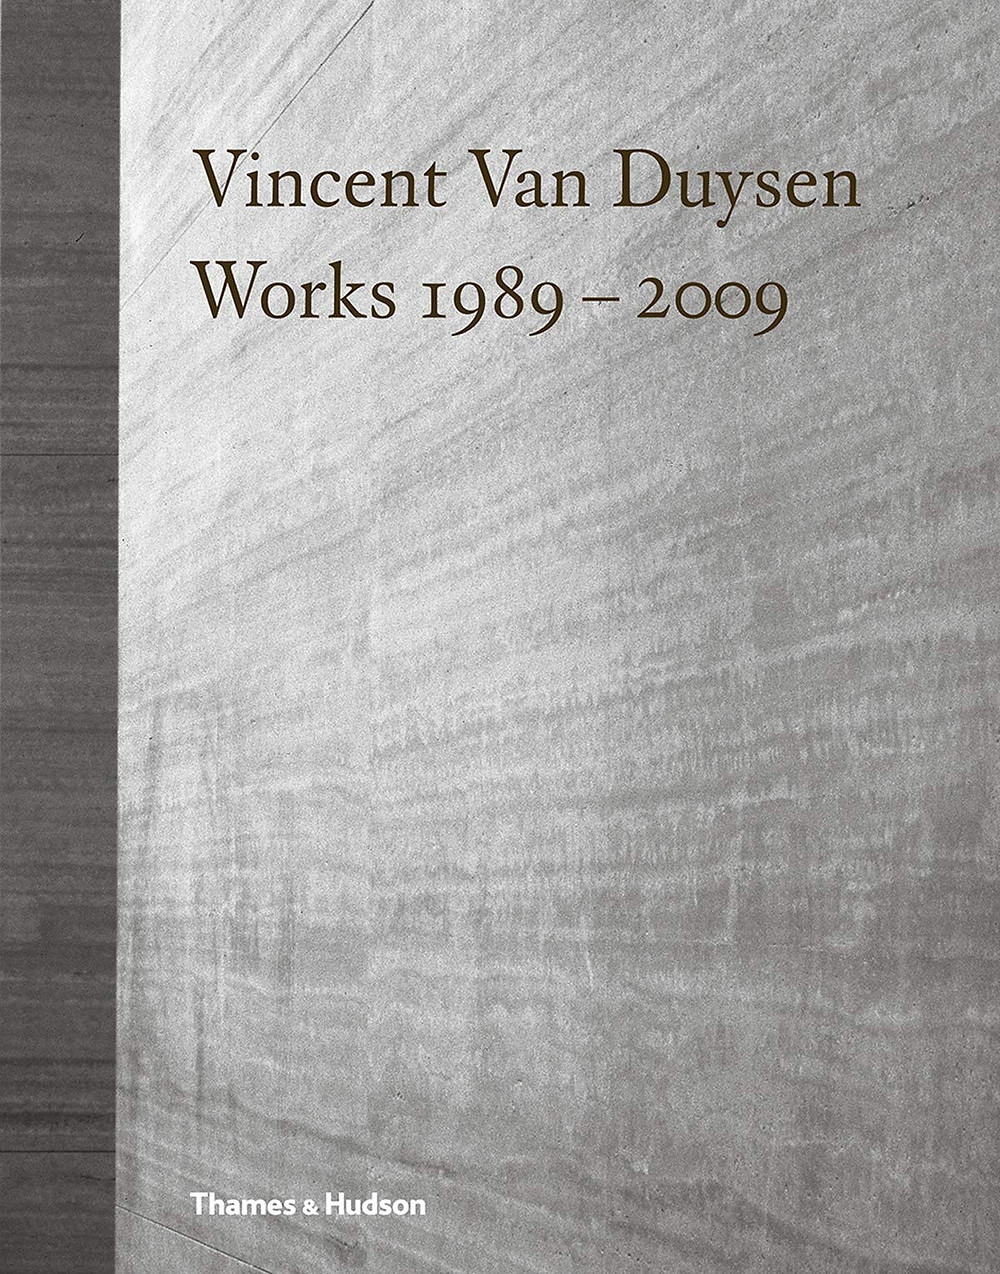 Vincent Van Duysen: Works 2009-2018 |Анонс новой монографии от Винсента Ван Дуйсена| блог| SENKO architects